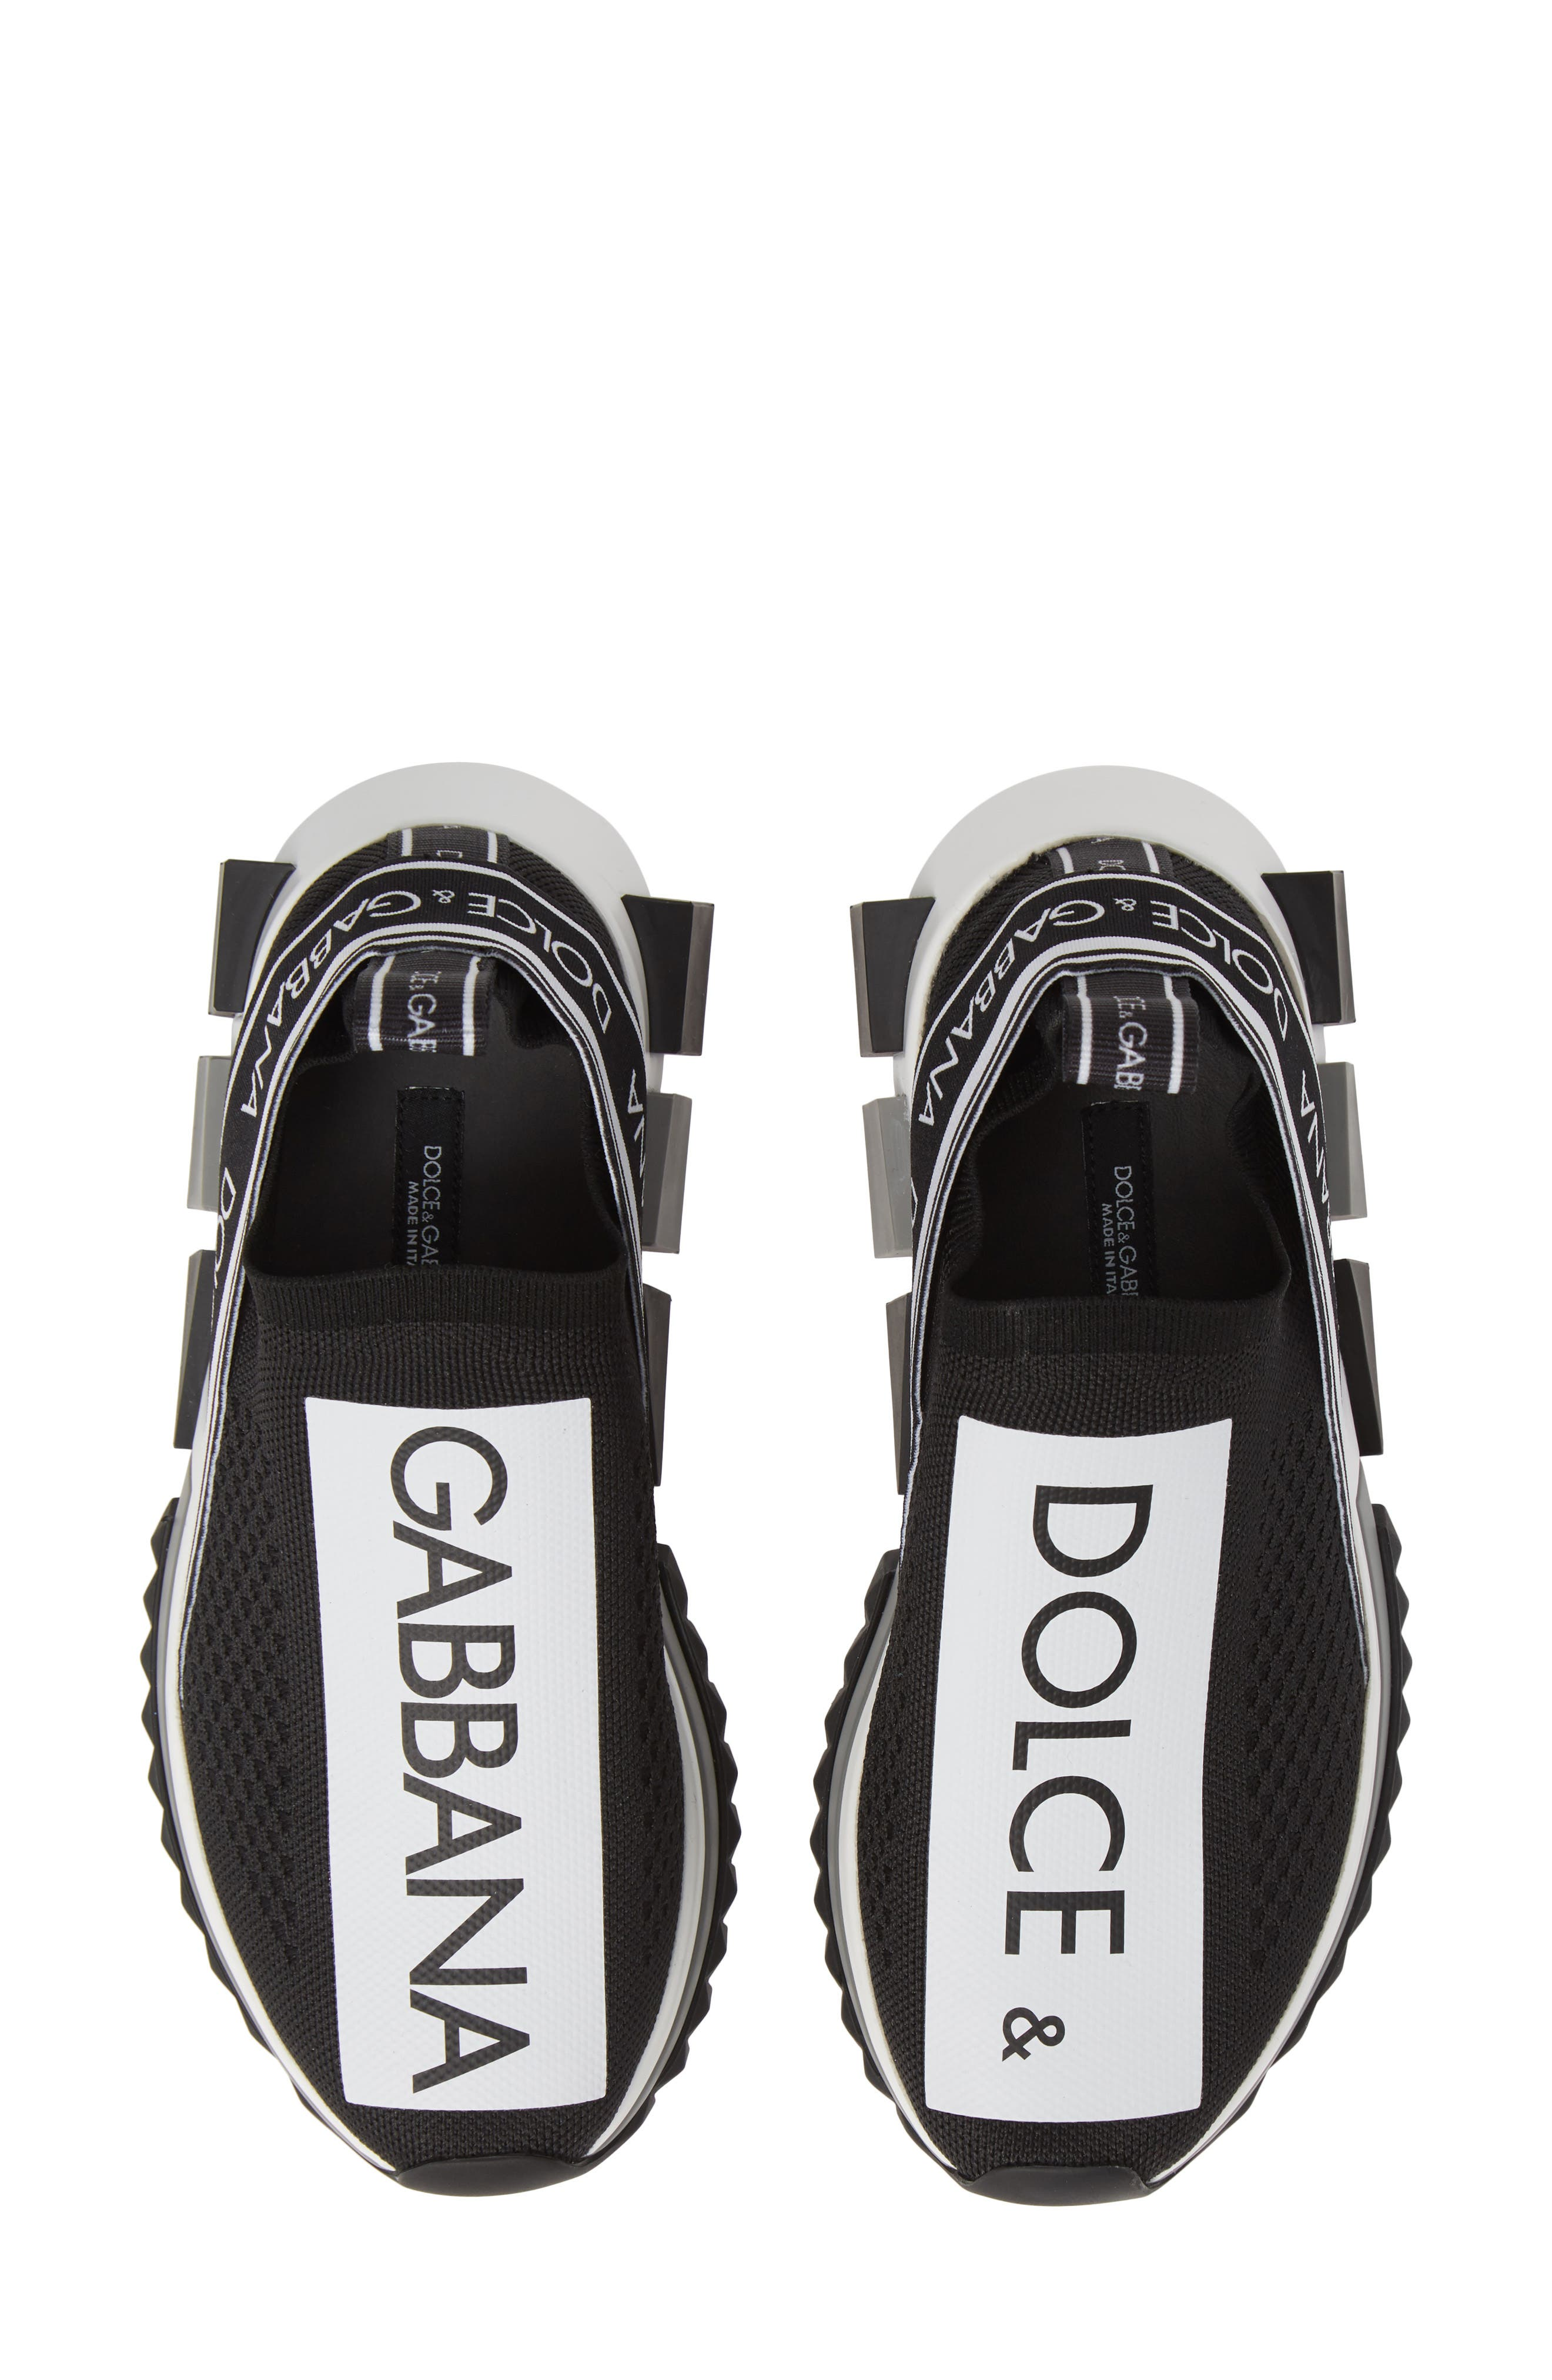 DOLCE&GABBANA, Sorrento Logo Slip-On Sneaker, Main thumbnail 1, color, 002